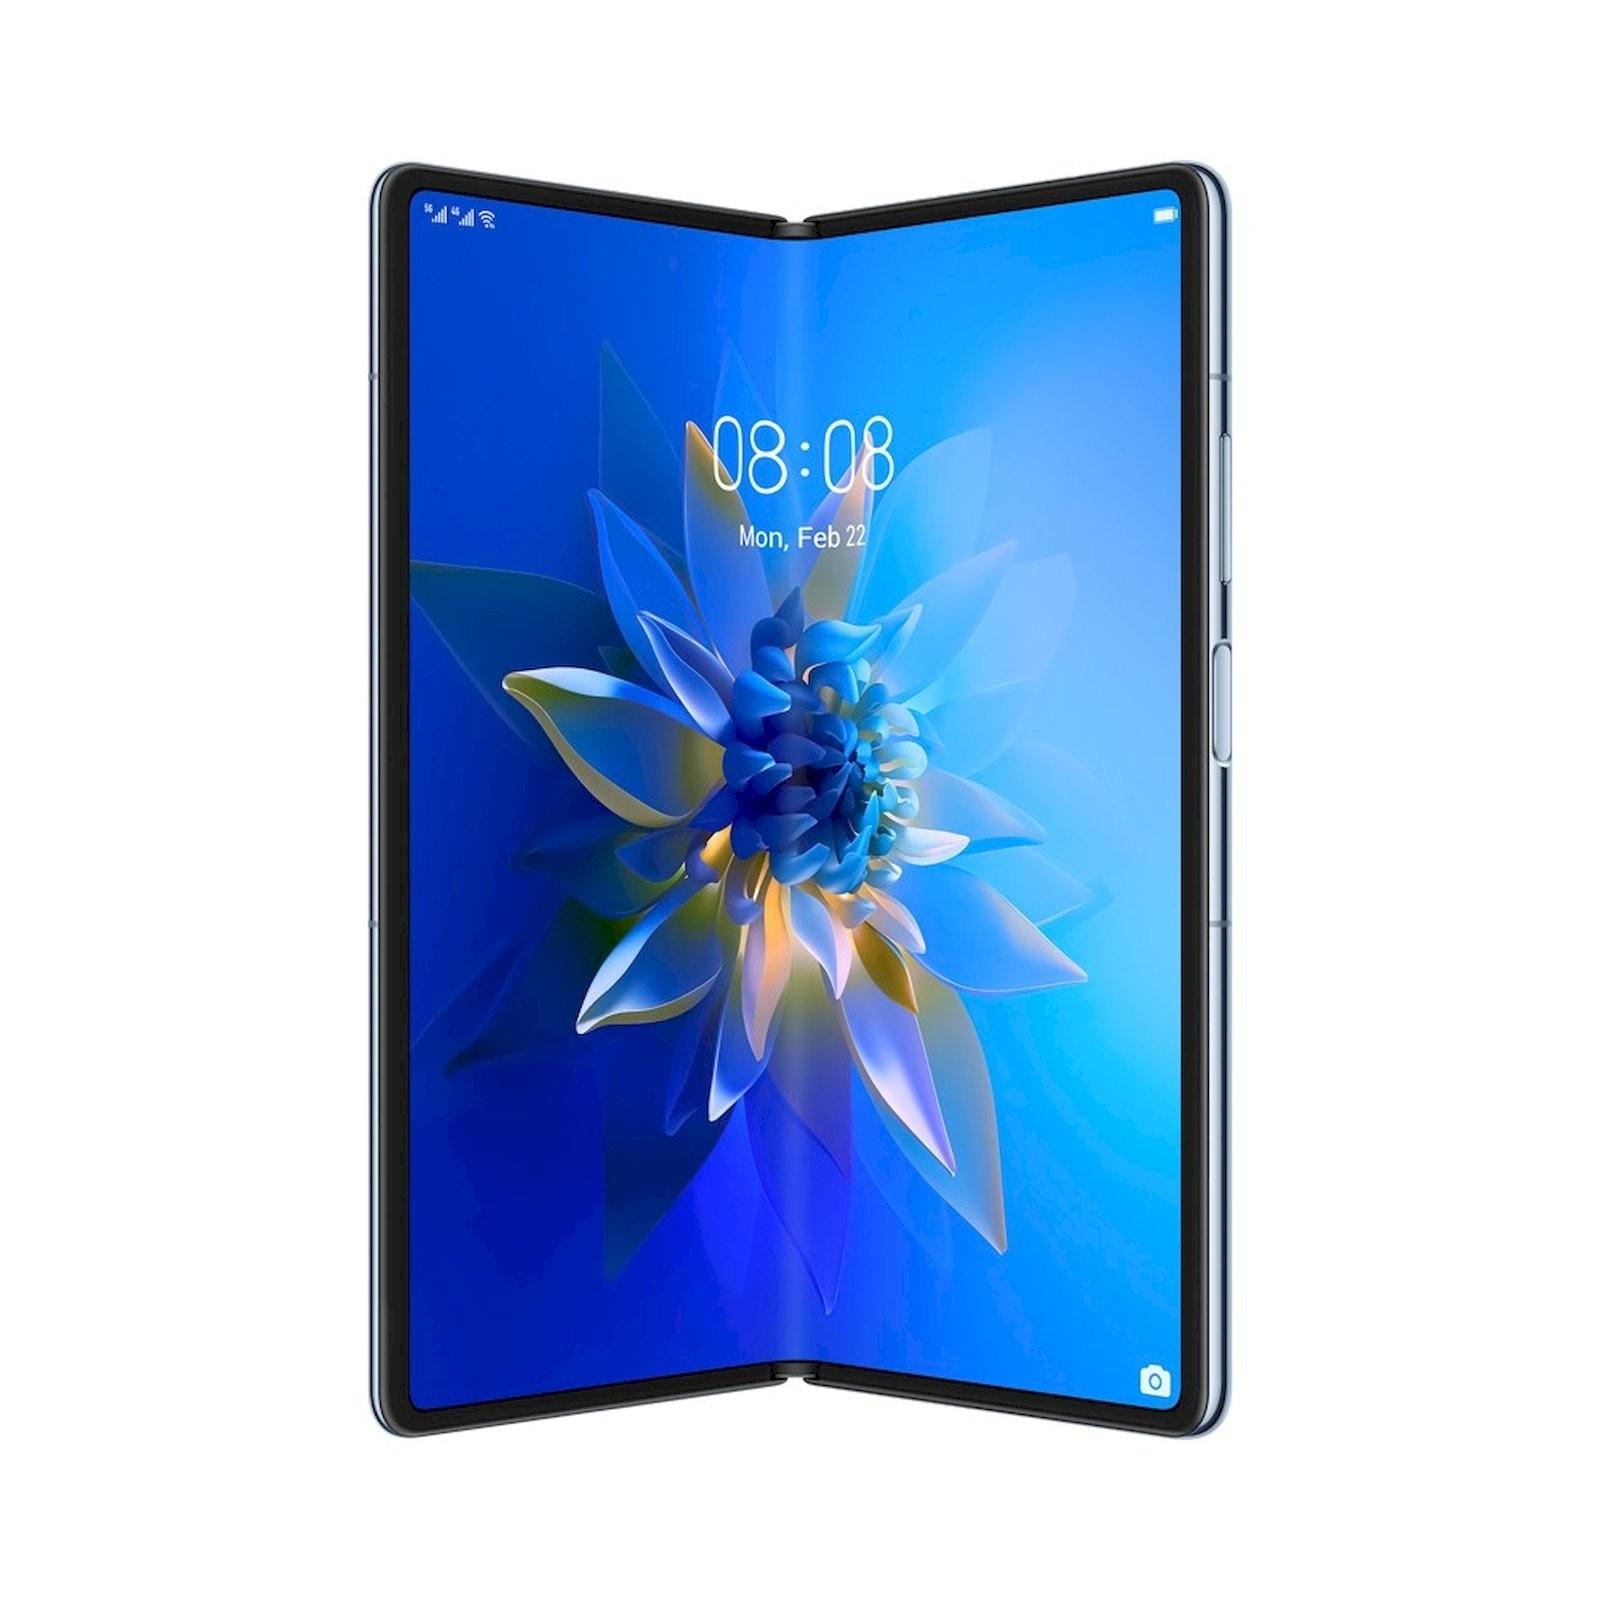 Huawei,smartphone,Mate X2